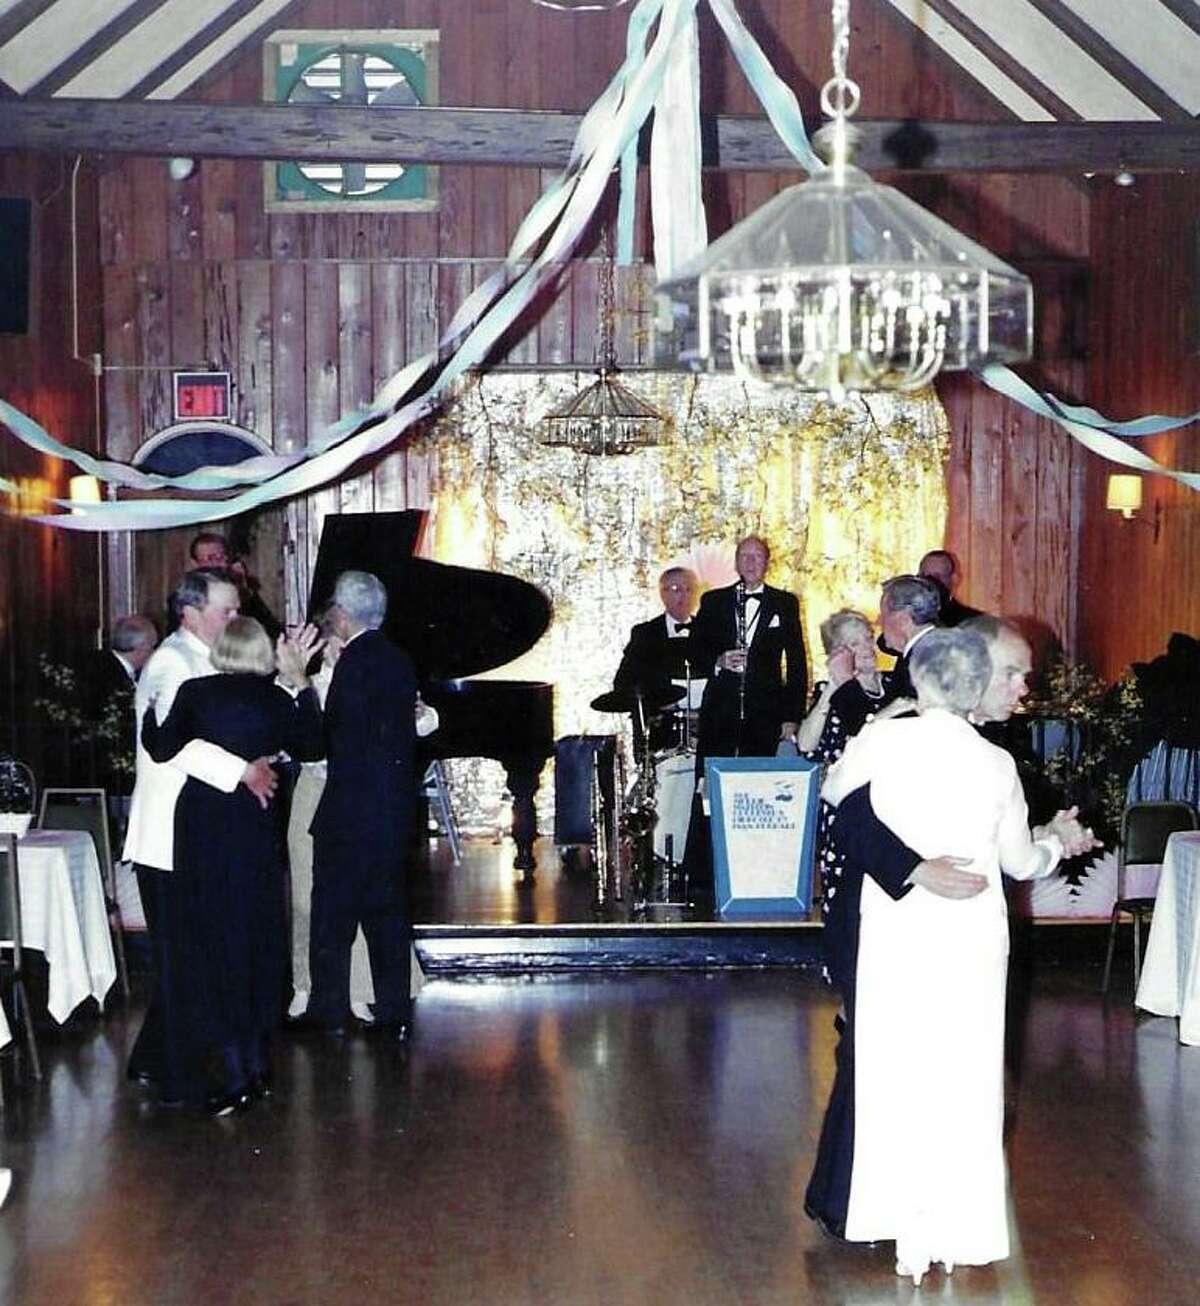 Dancing cheek to cheek at the Madison Winter Club